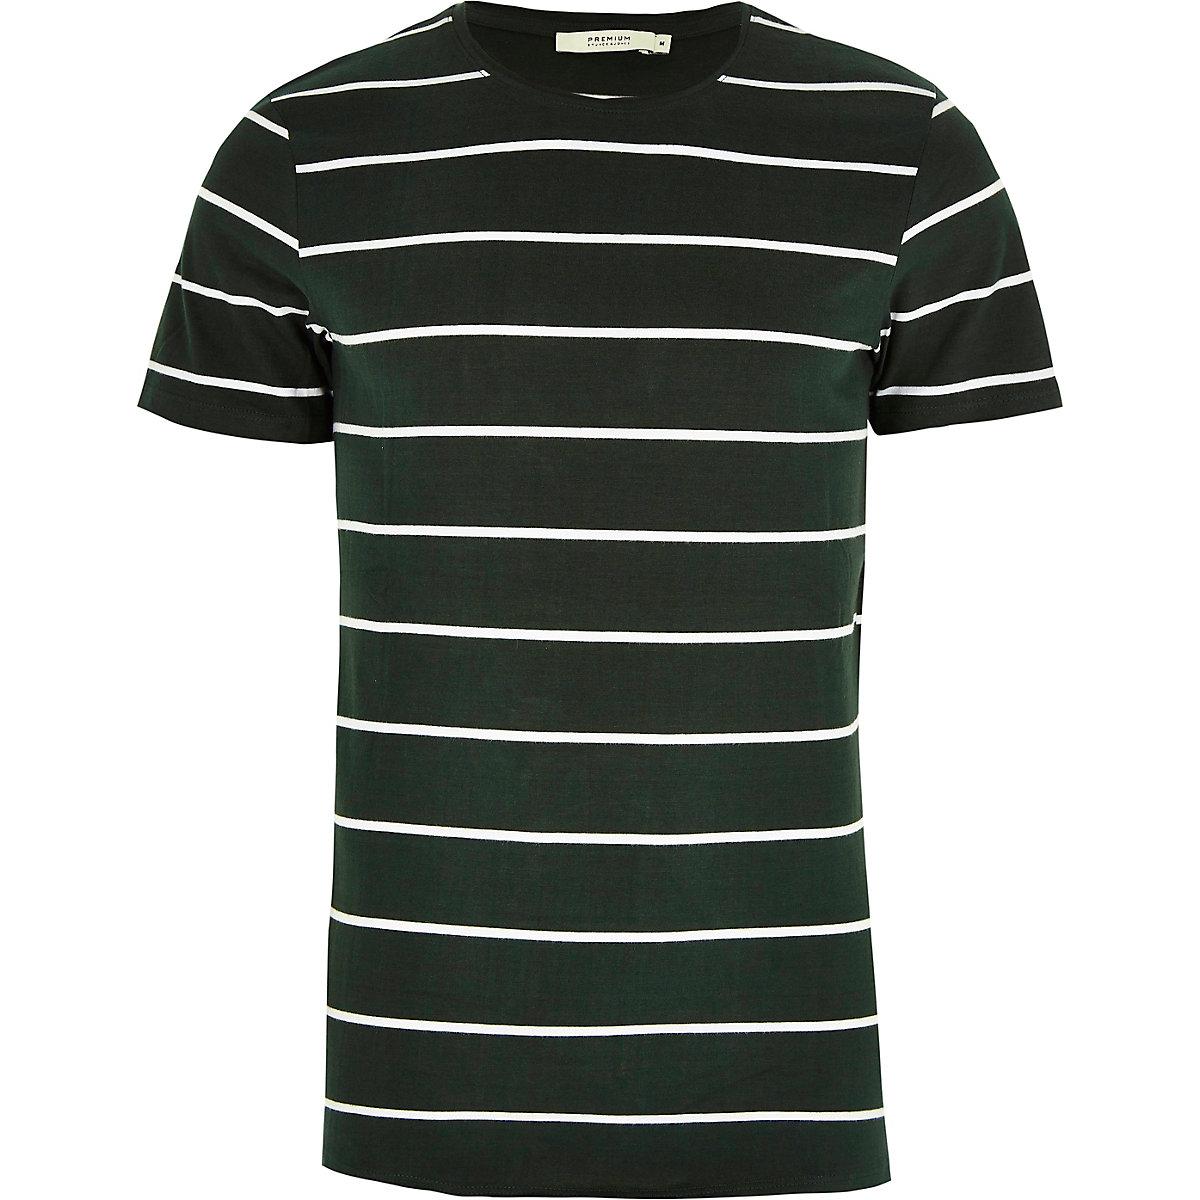 Jack & Jones green stripe T-shirt